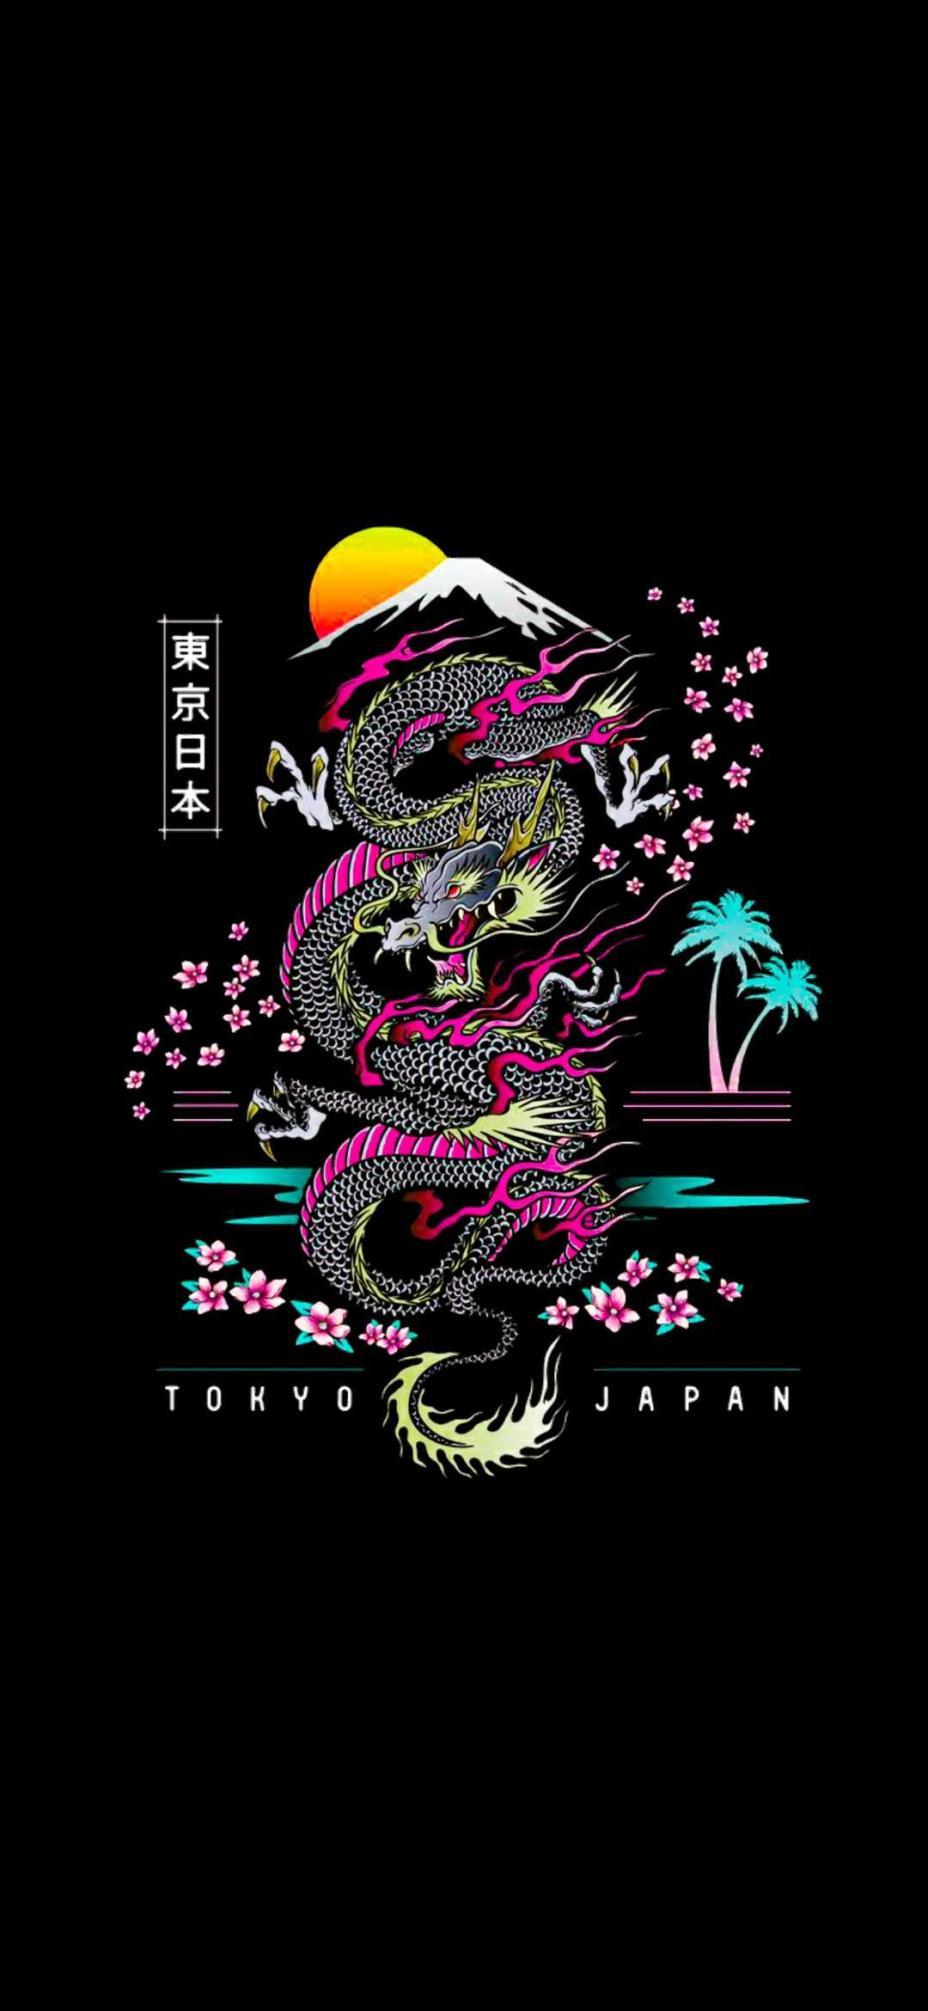 Tokyo Japan Dragon Wallpaper Wallpapers For Tech